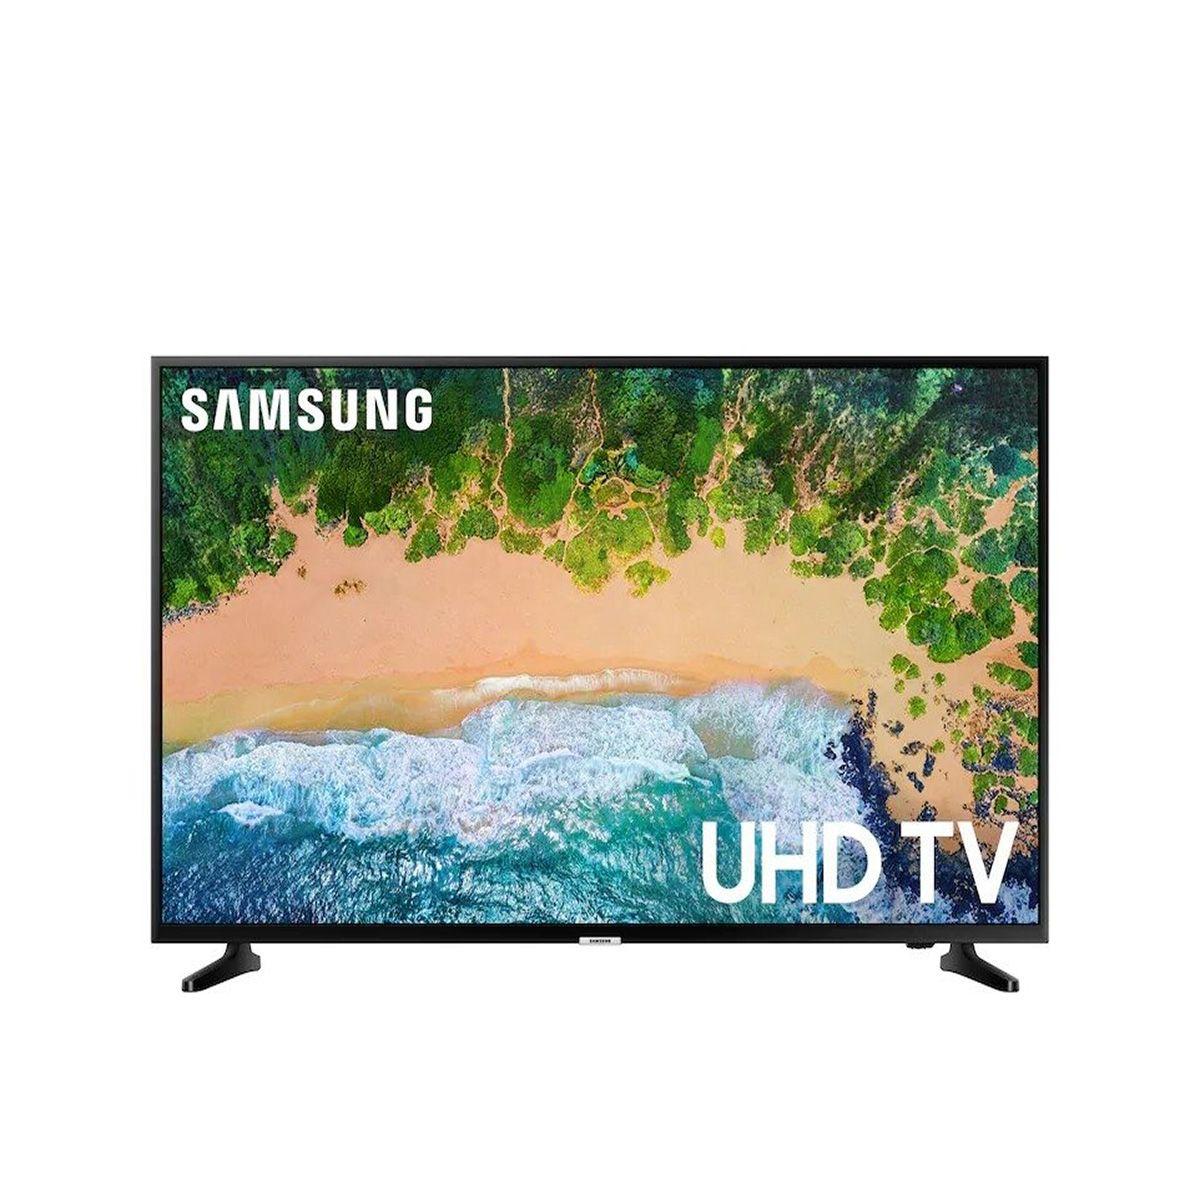 Samsung Tv UHD 4K Smart 50″ UN50NU6900BXZA